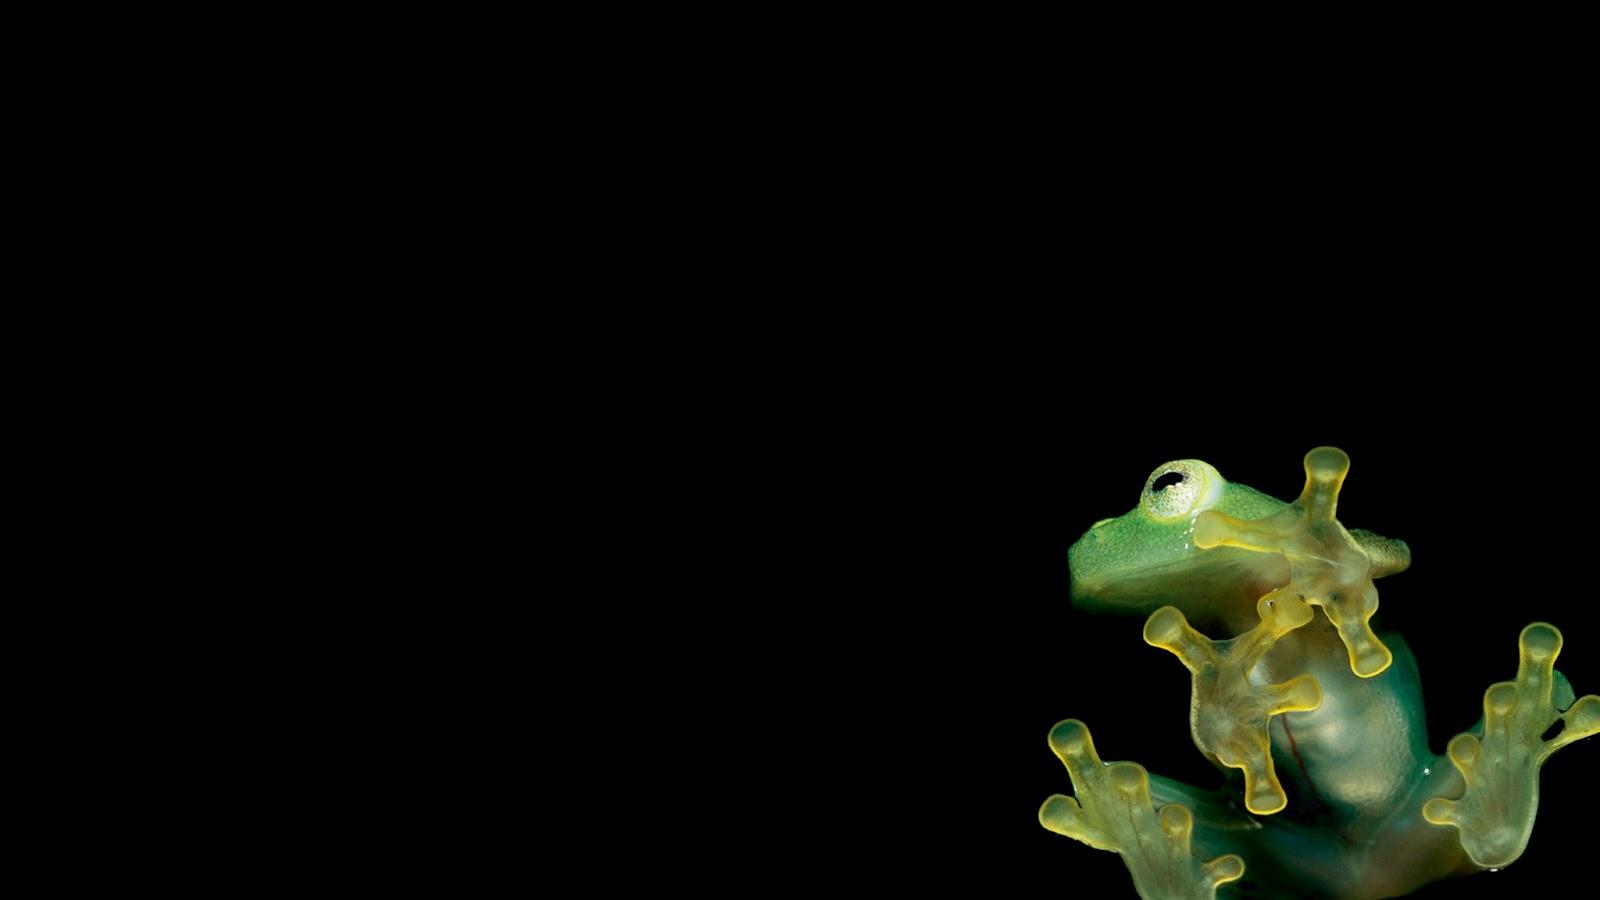 Download free Motorola Shadow frog wallpapers newest Zedge